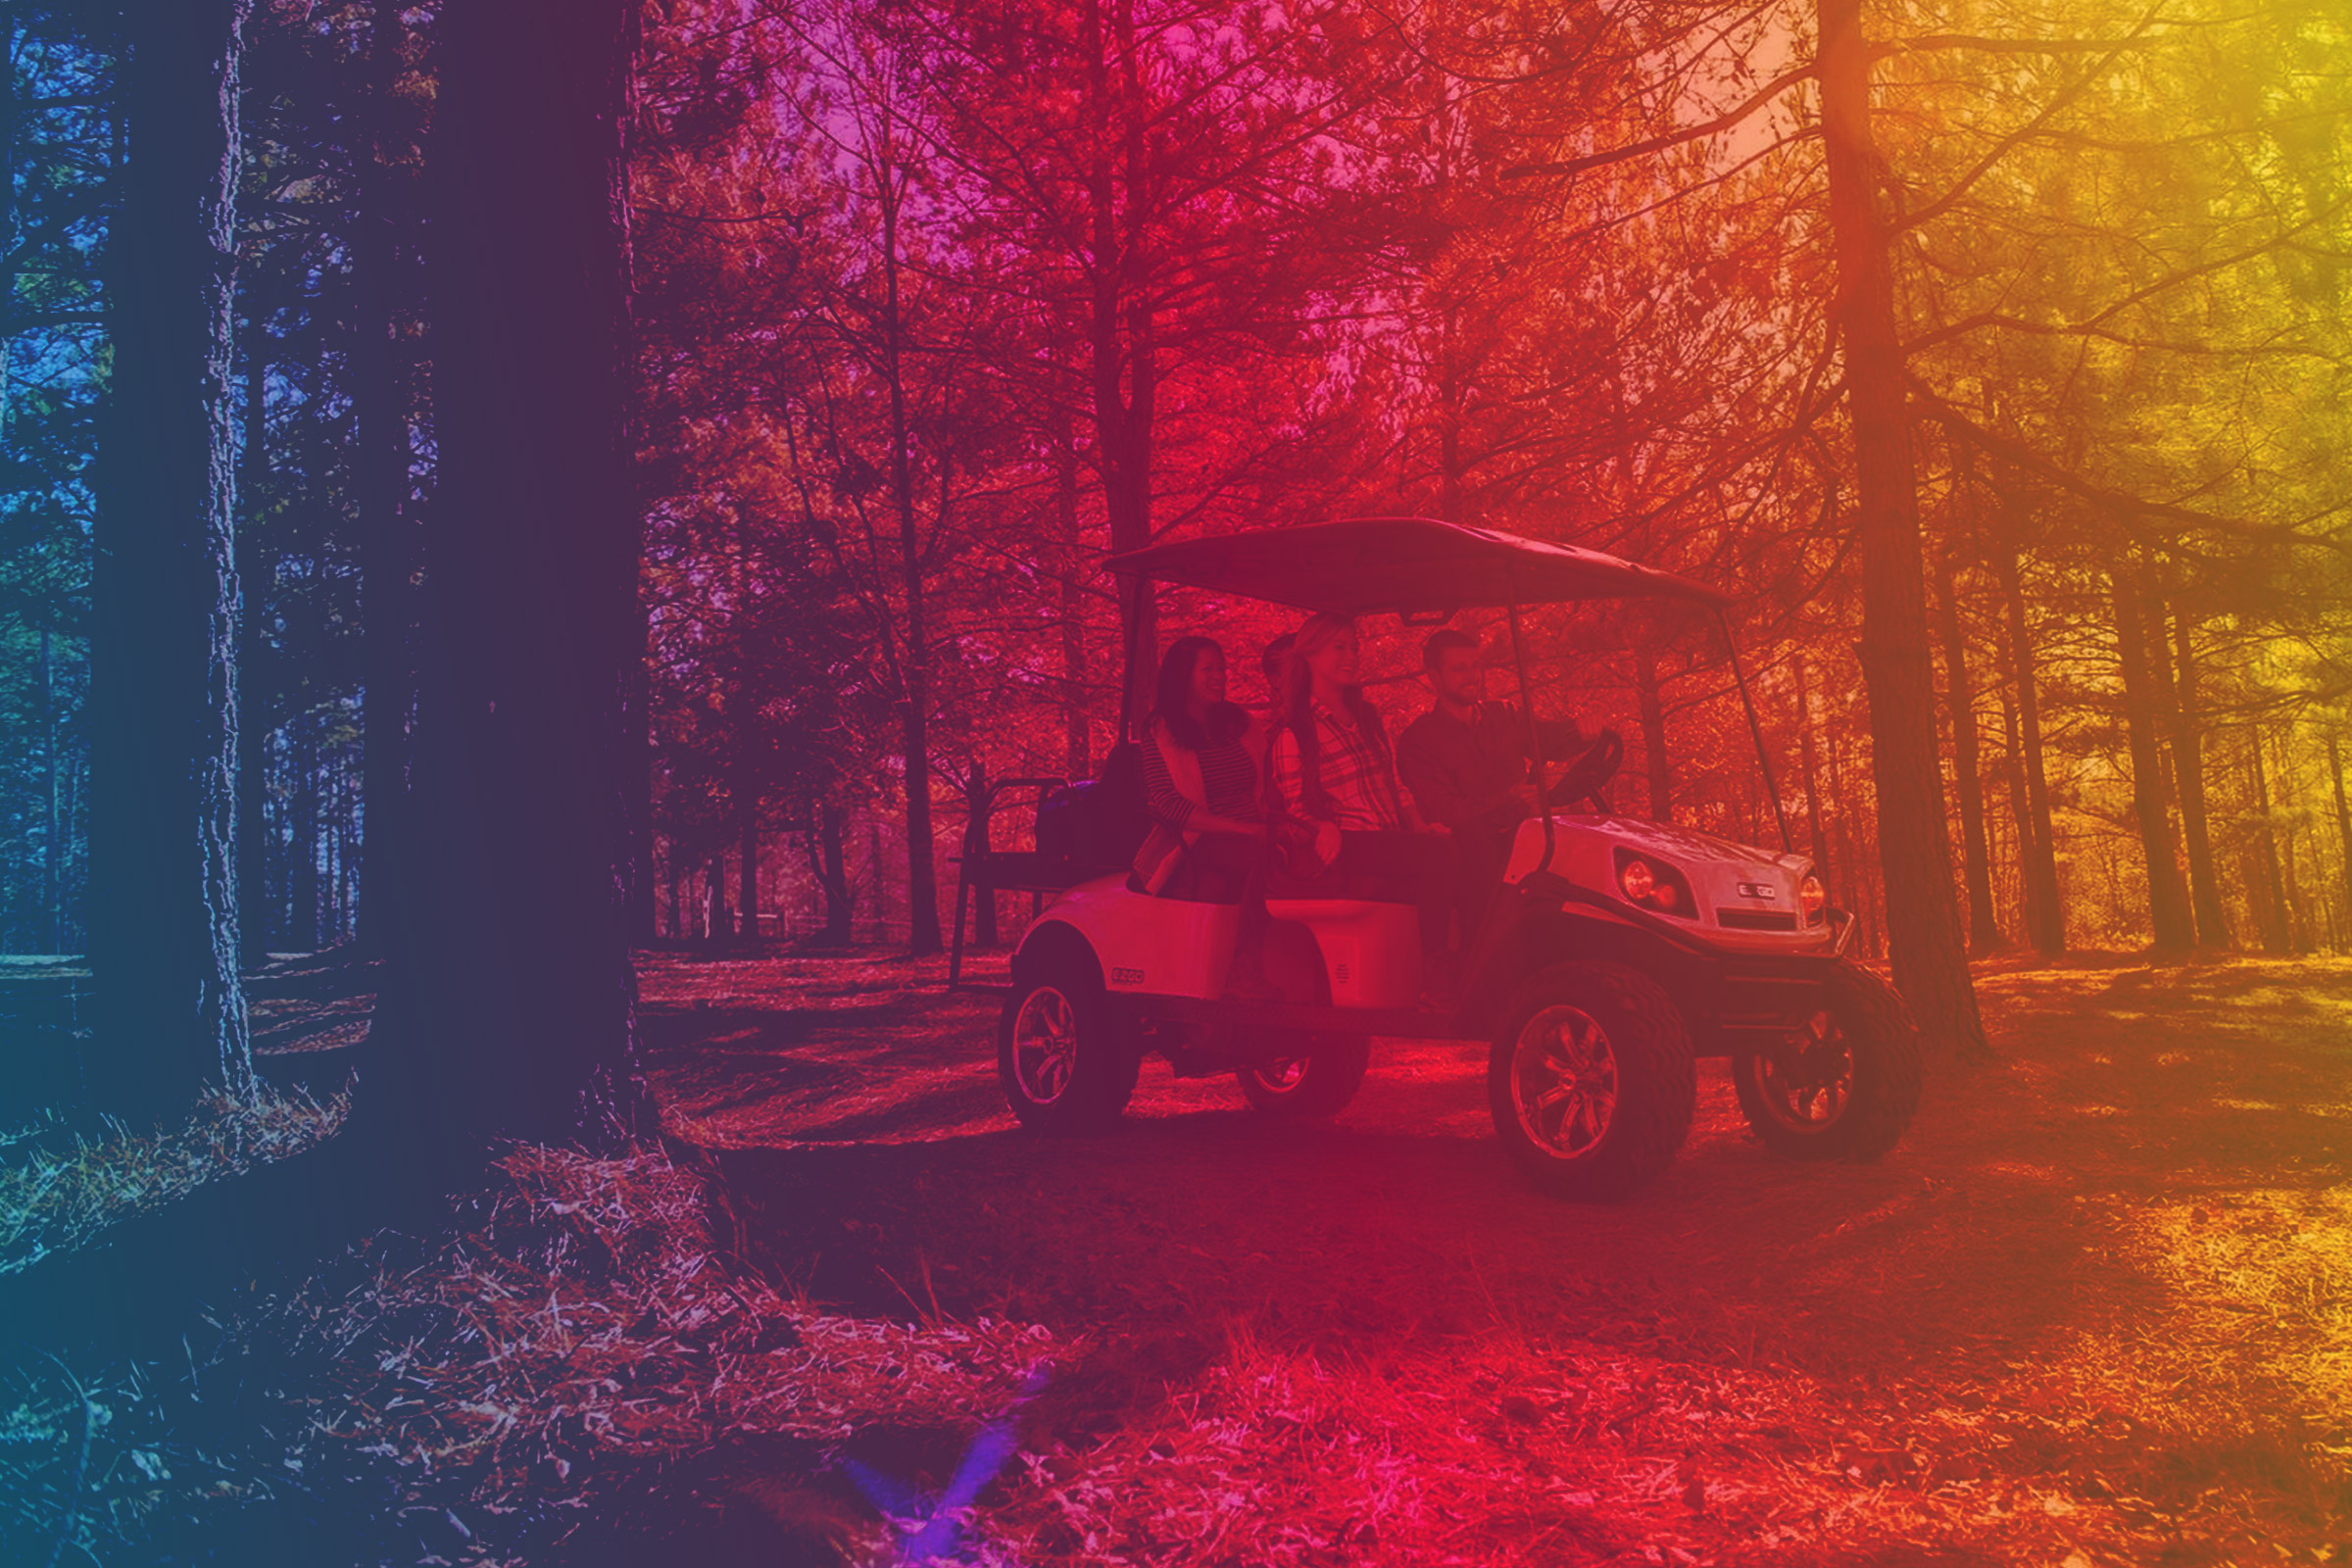 Electrify Expo Electric Golf Cart image